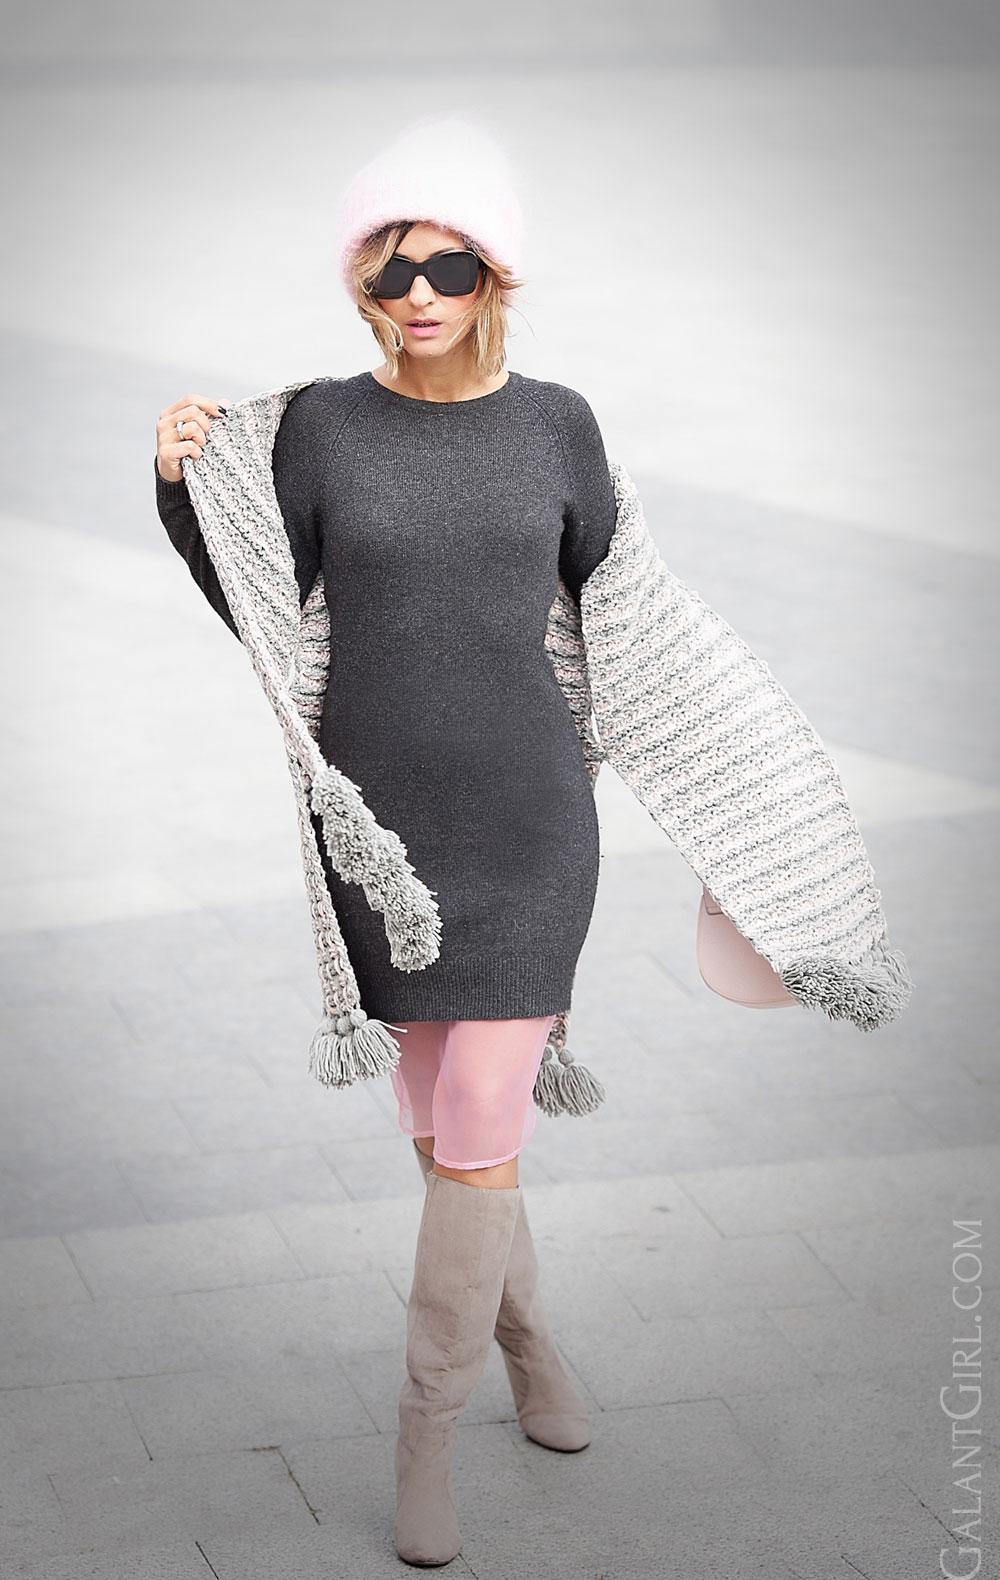 fashion+blogger-ellena+galant+girl